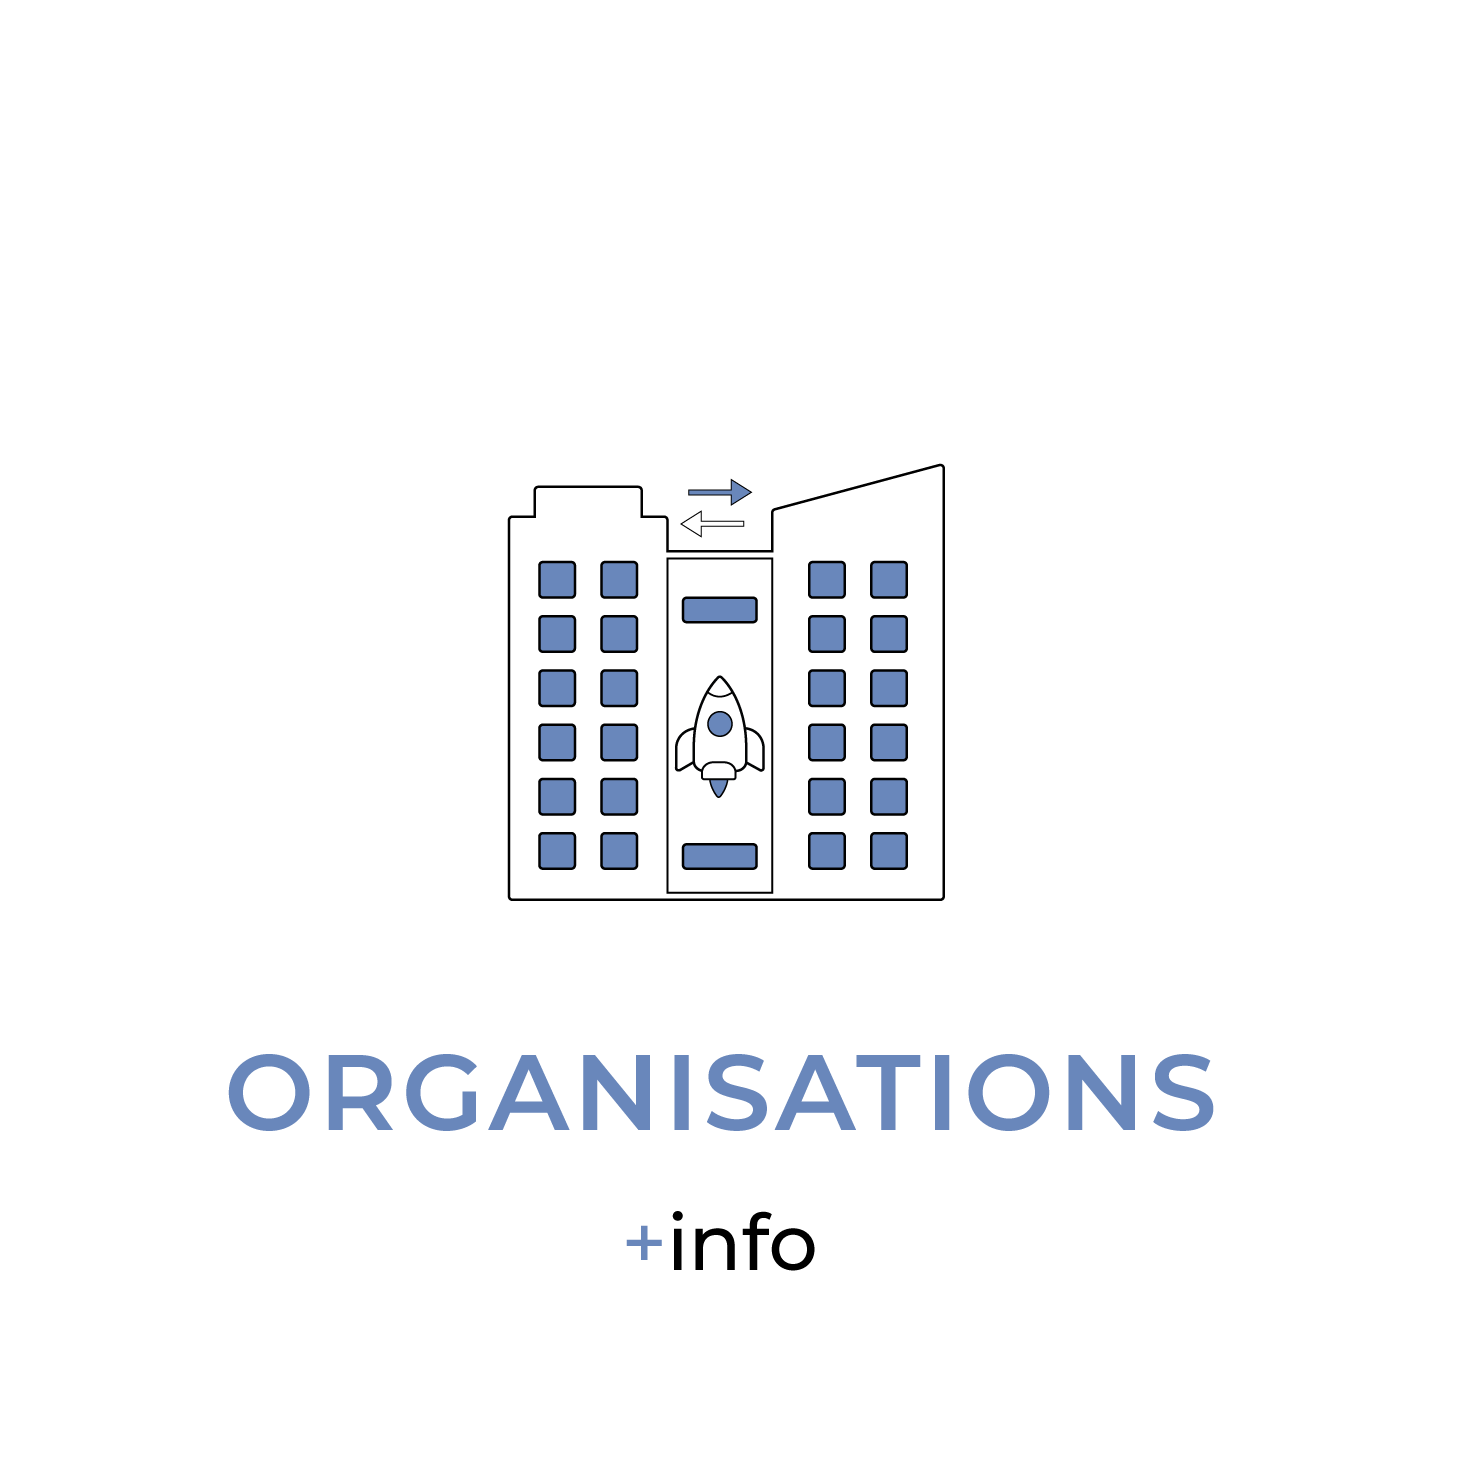 SDGS organizations